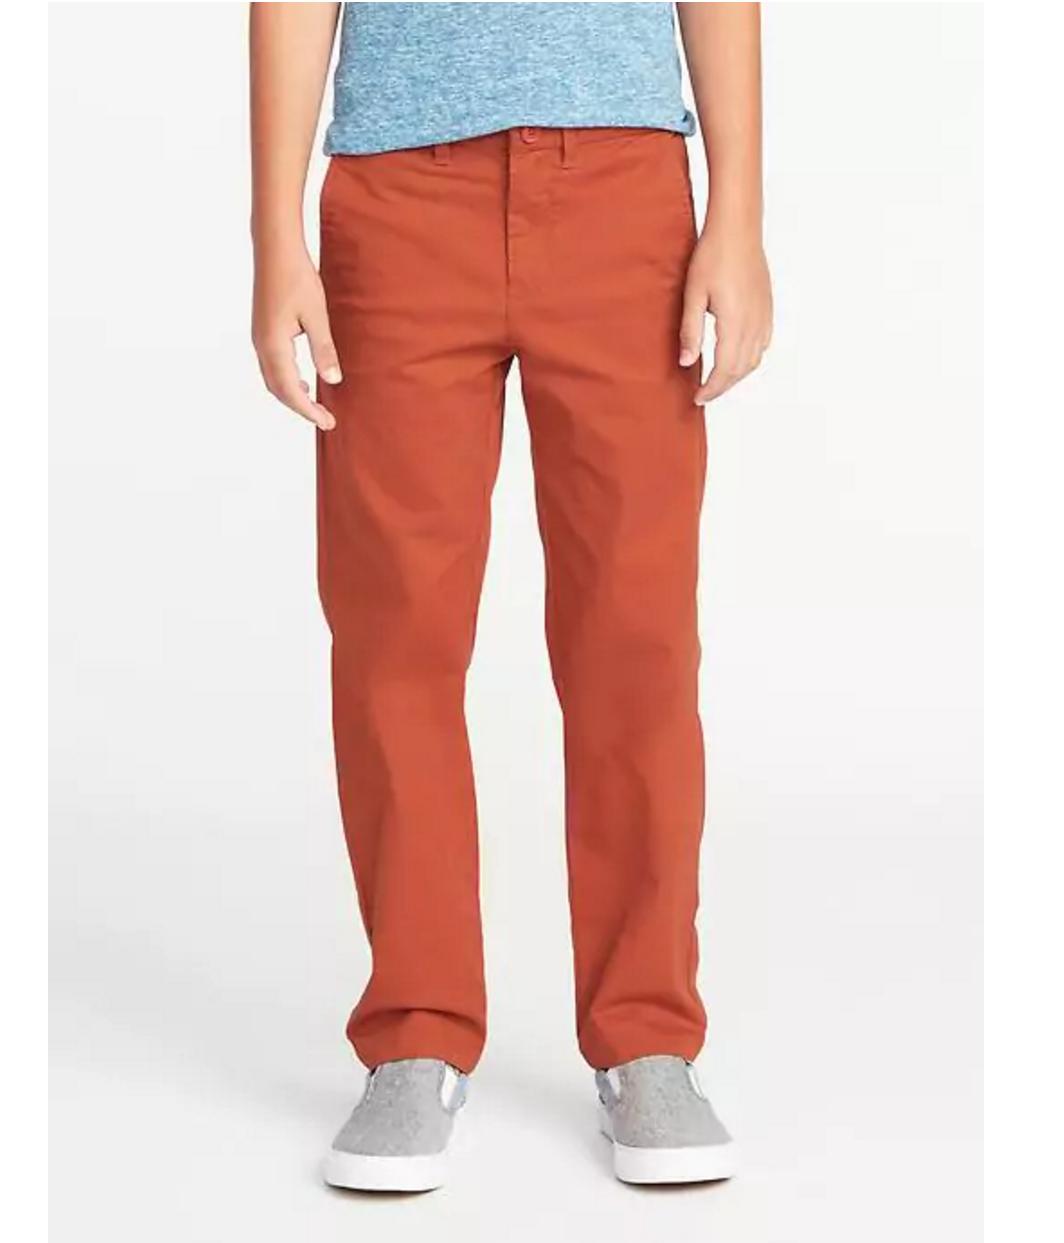 Tanger Outlets Old Navy Outlet boy's slim khaki pants